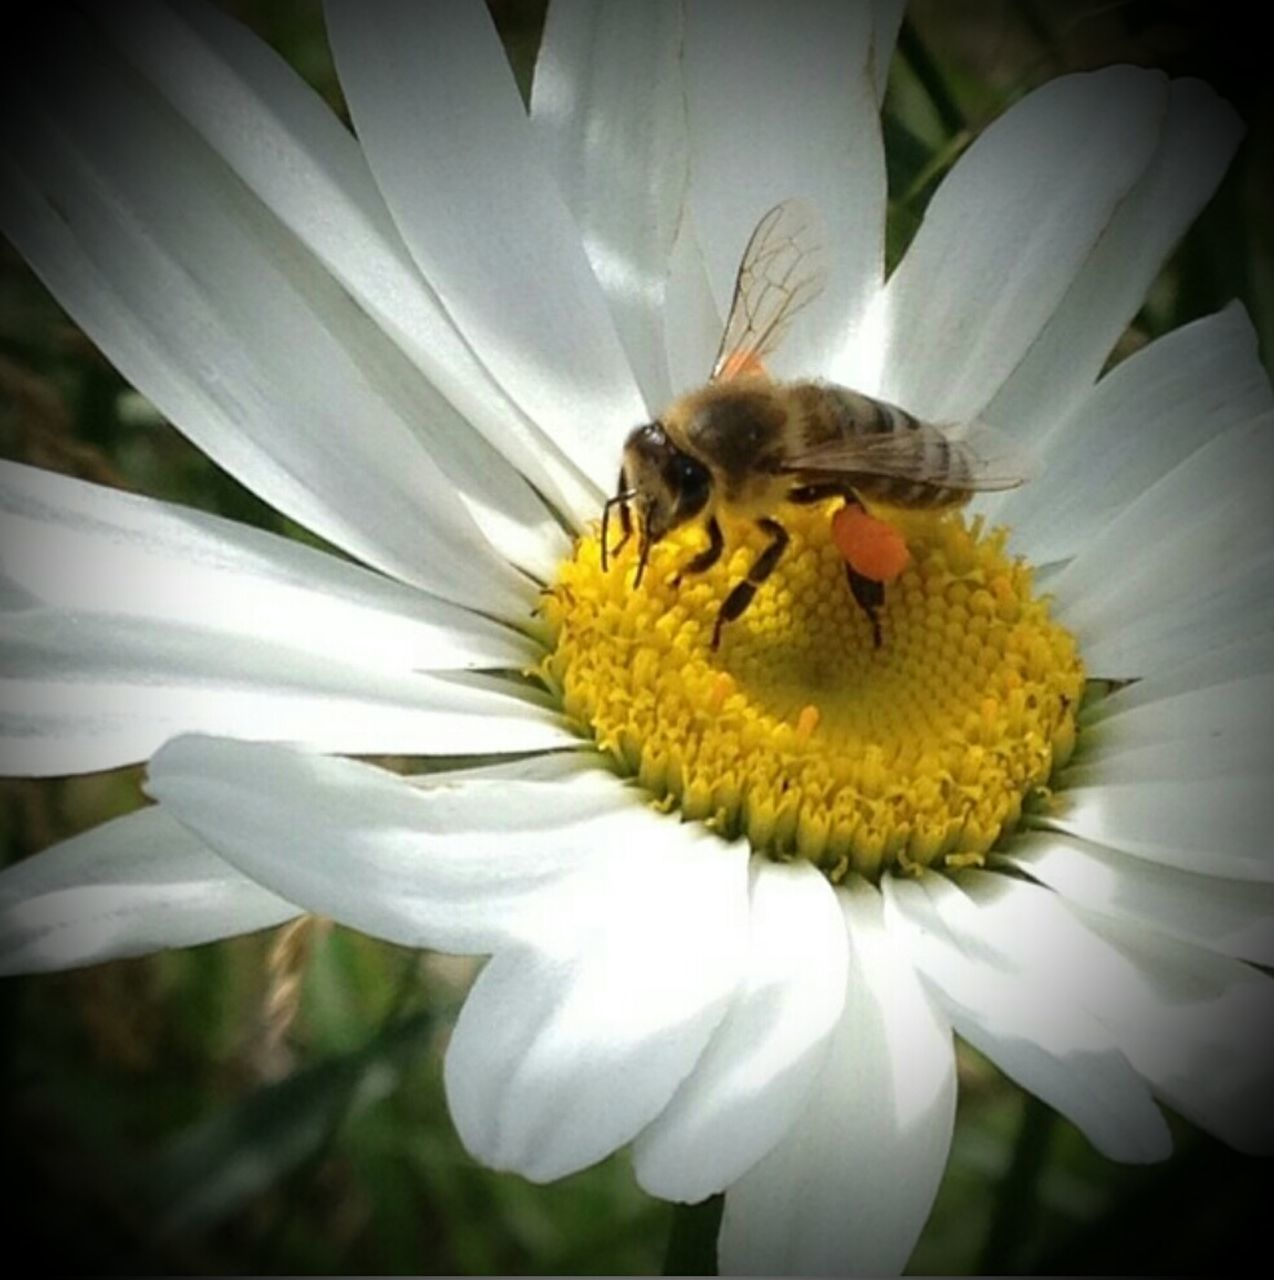 High Angle View Of Honeybee On Daisy